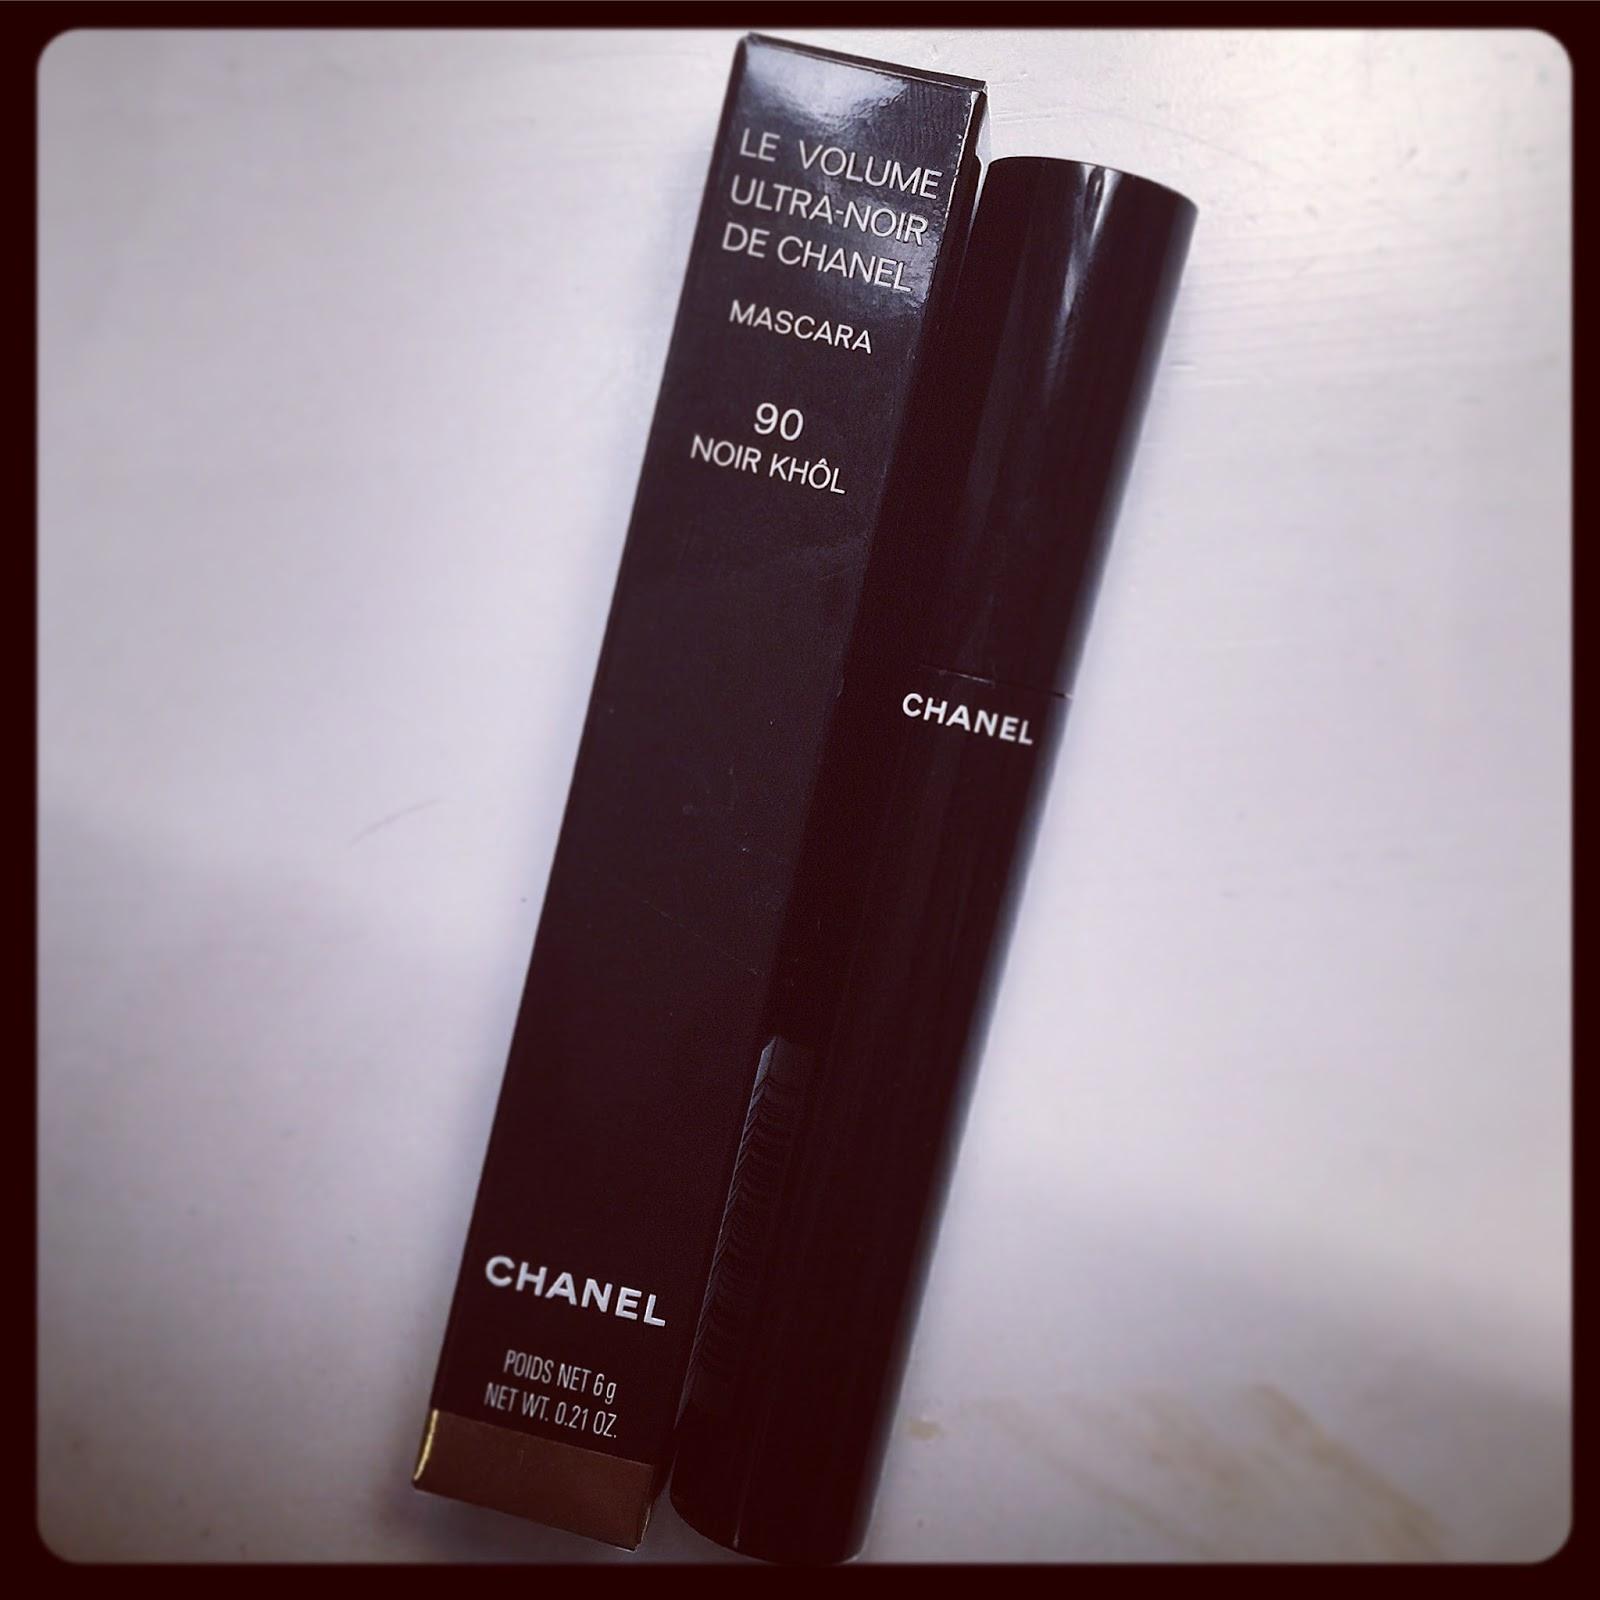 Ingredients chanel mascara